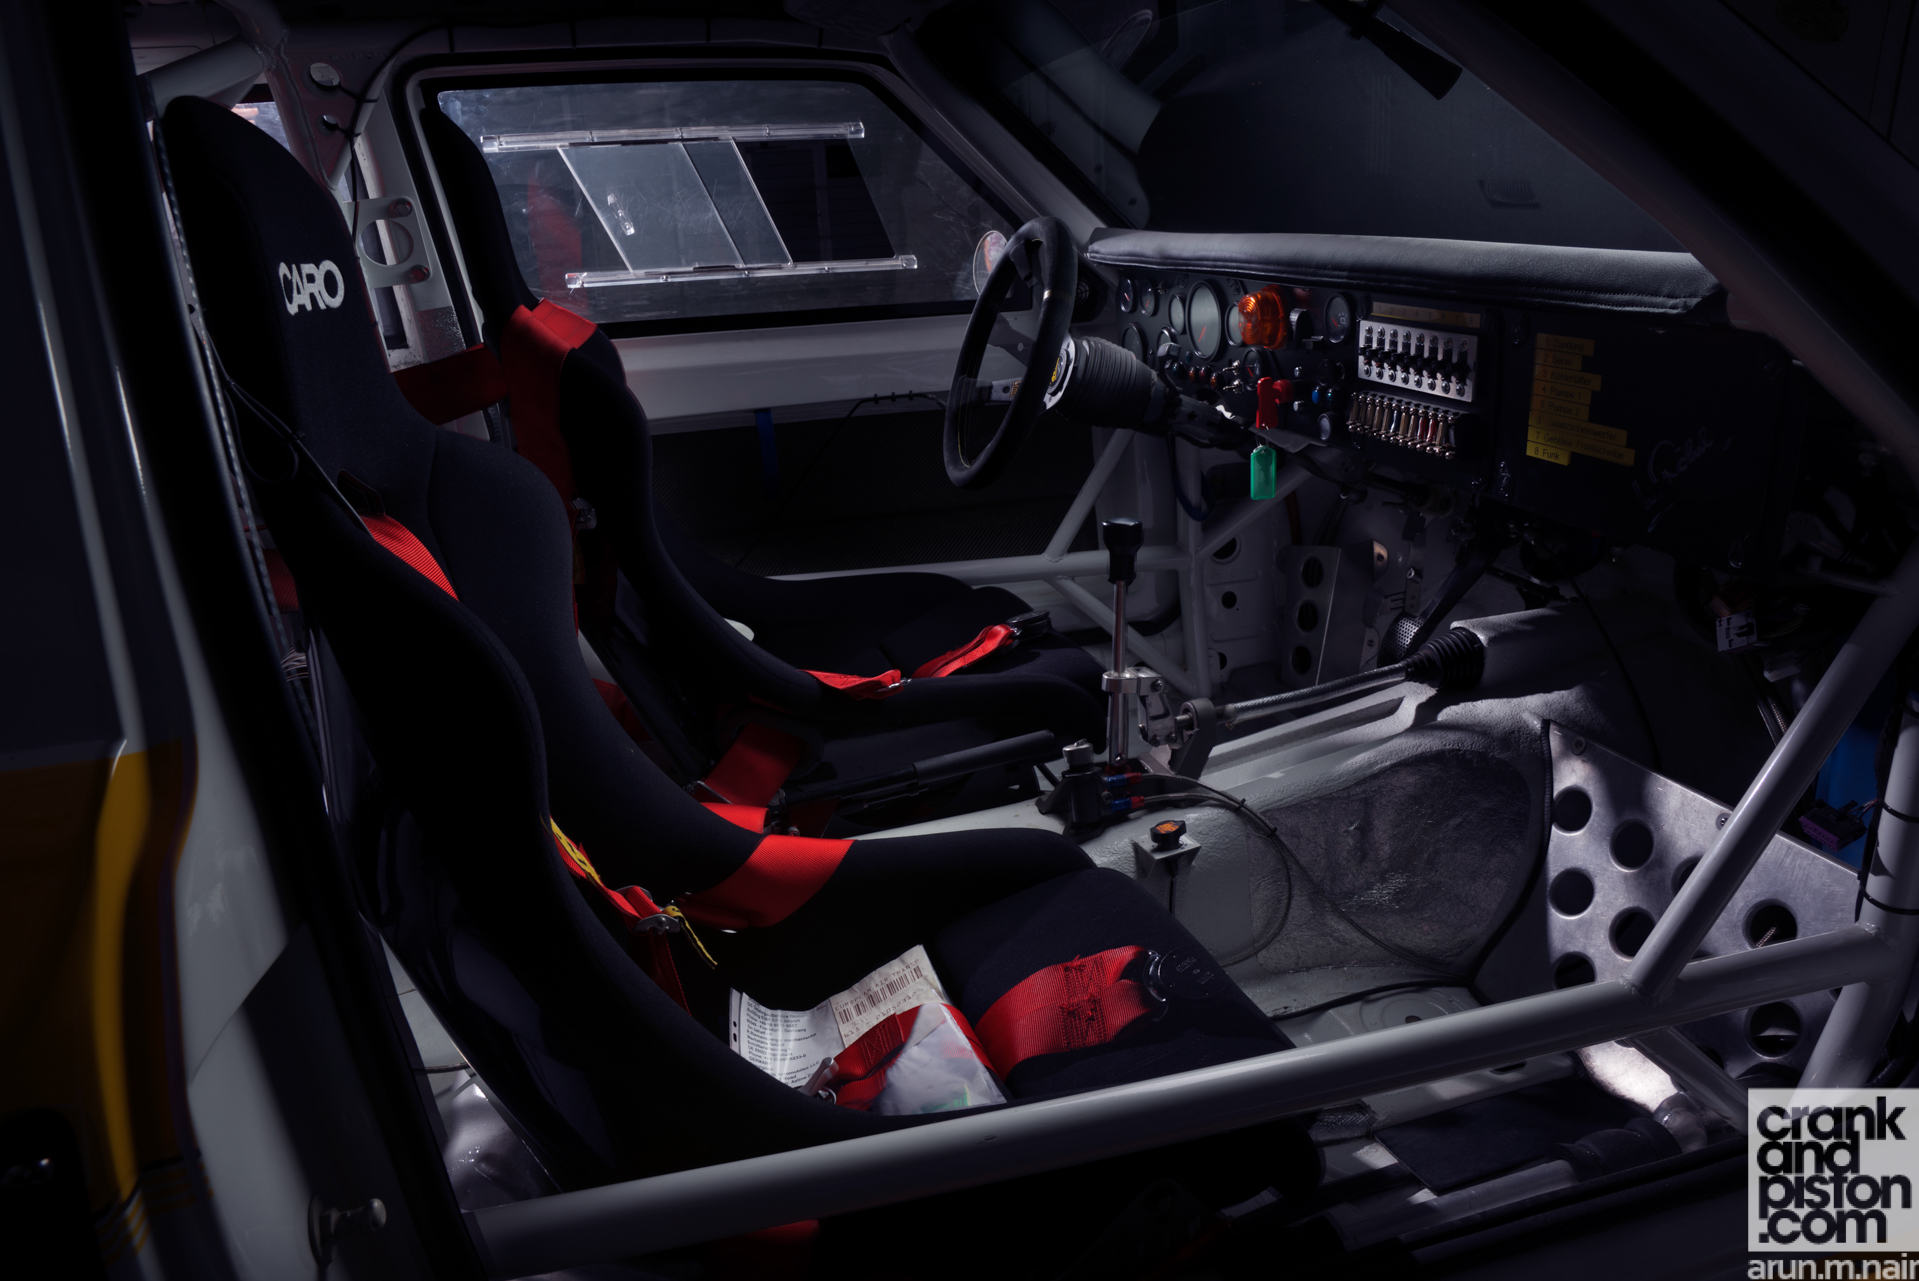 1986 Audi S1 Quattro replica crankandpiston-15